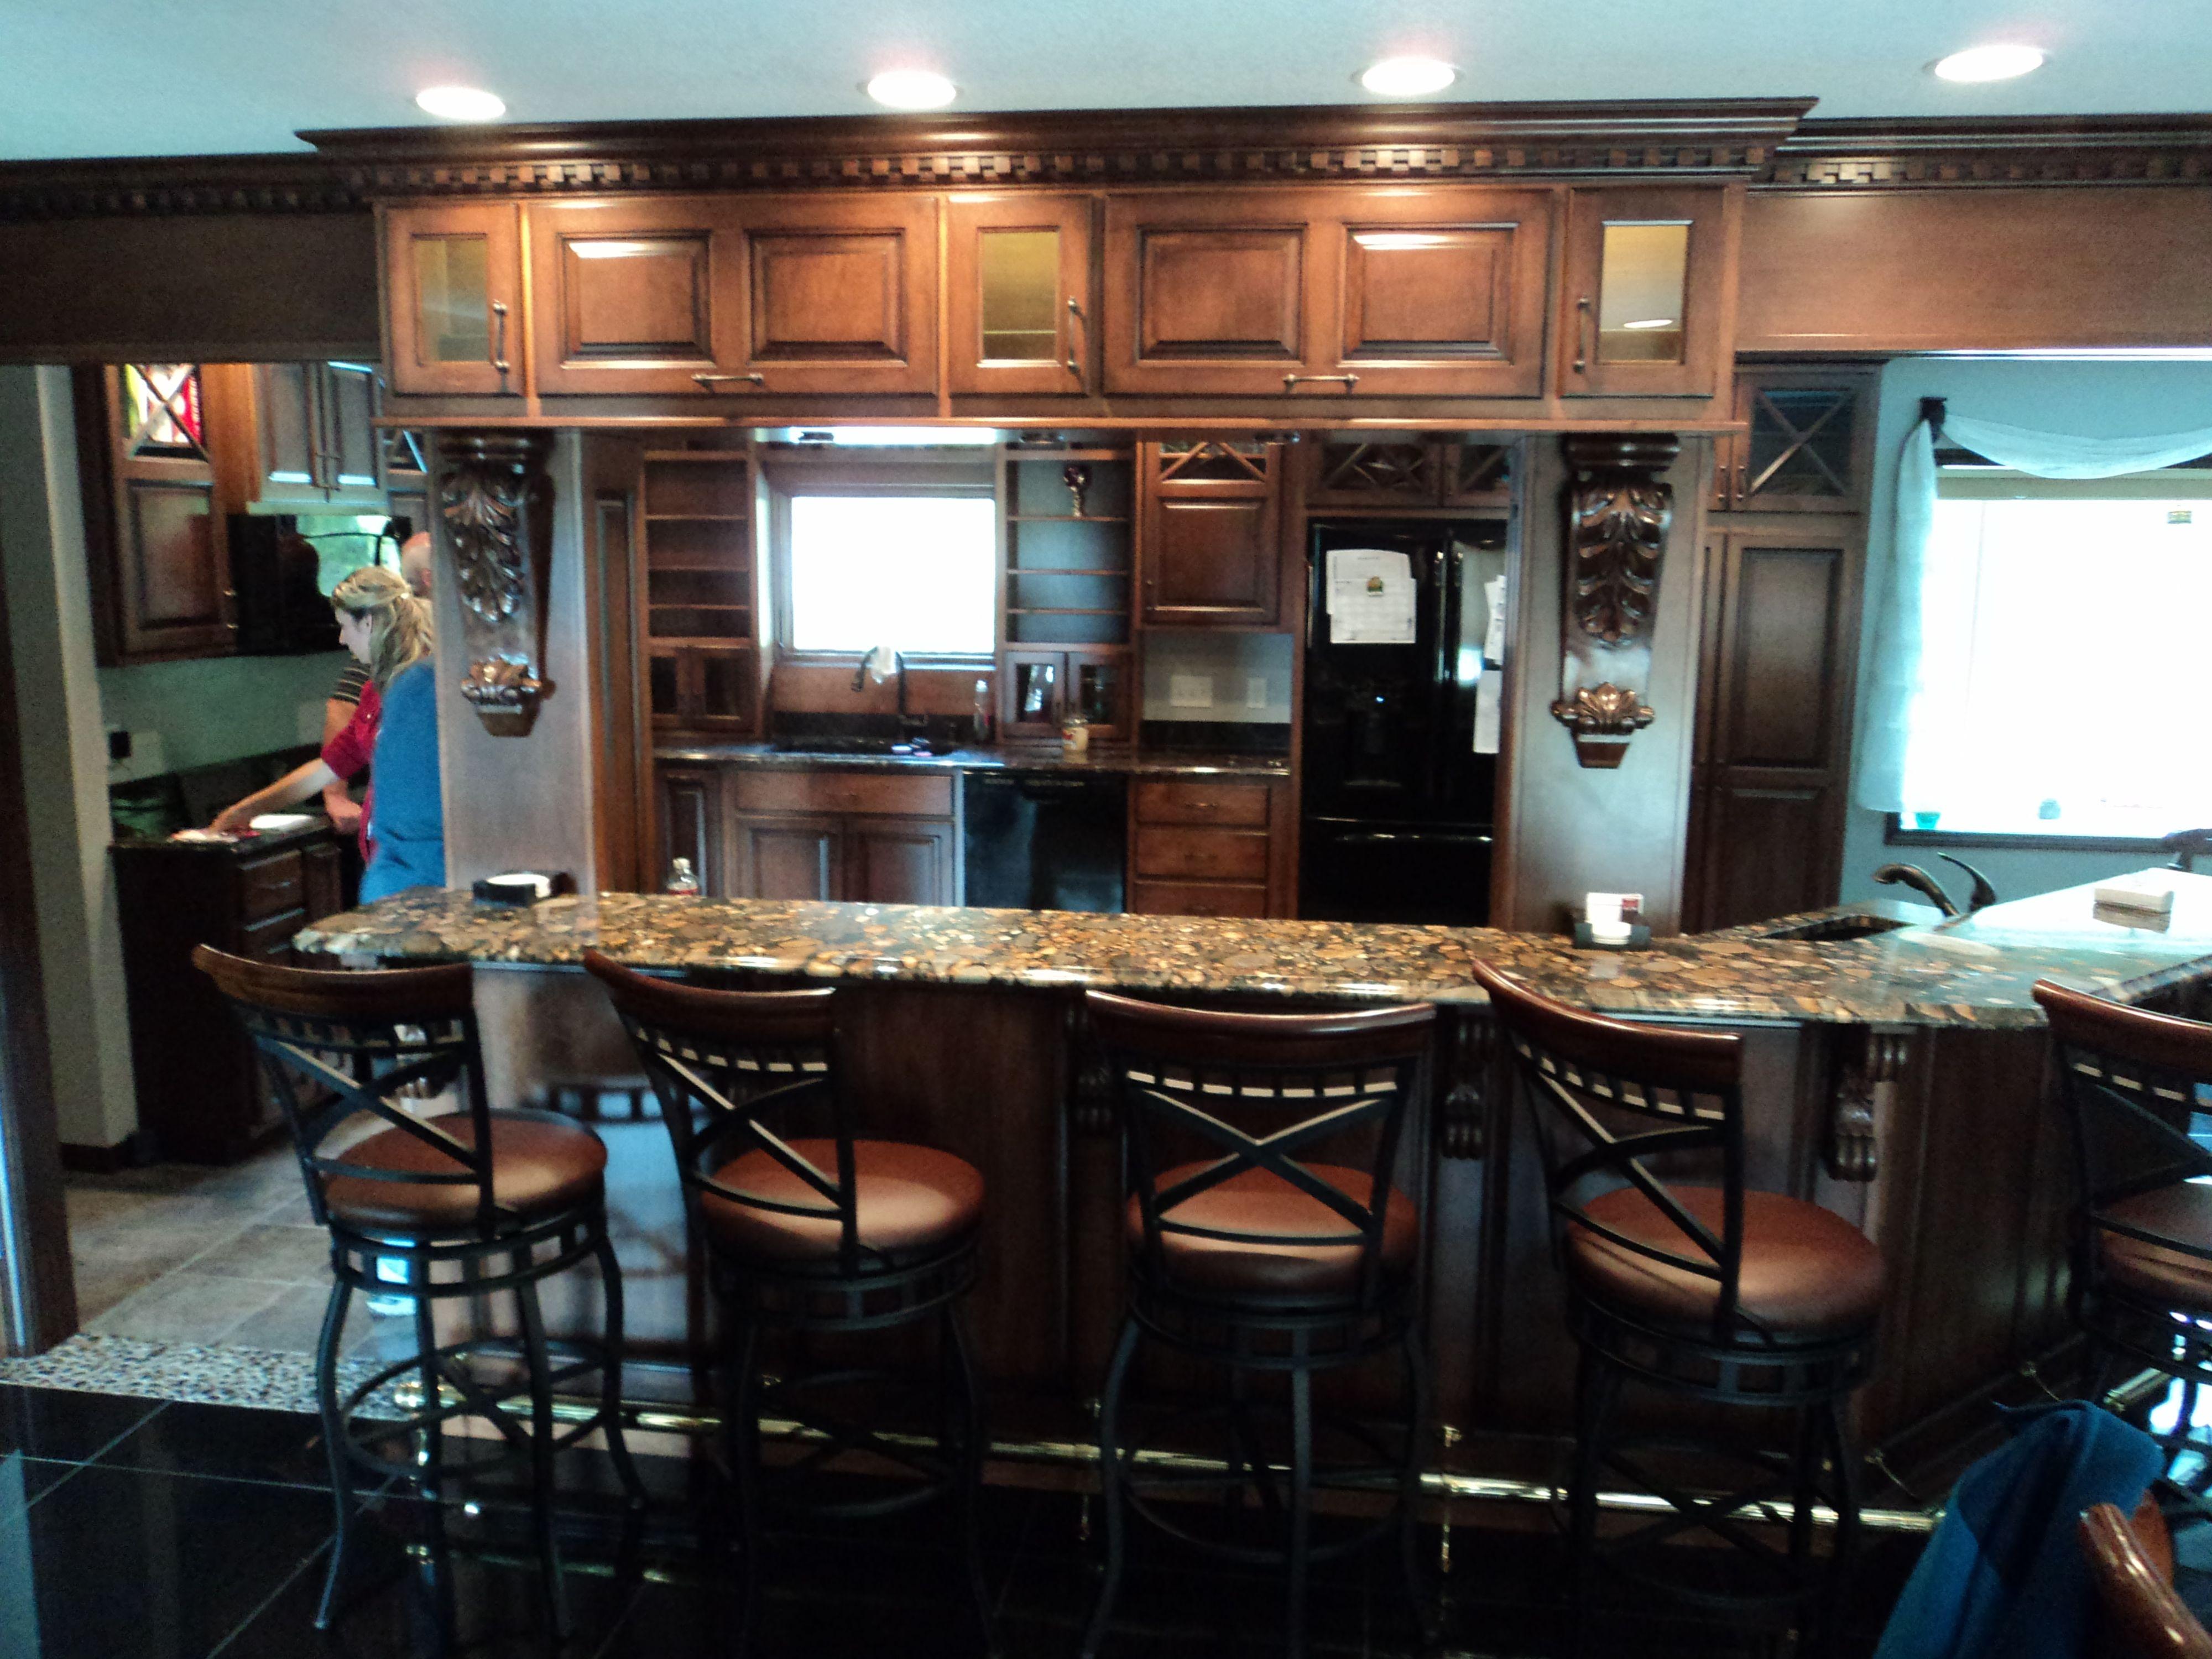 High End Kitchen Cabinets High End Kitchen Remodel After Kitchen Cabinets